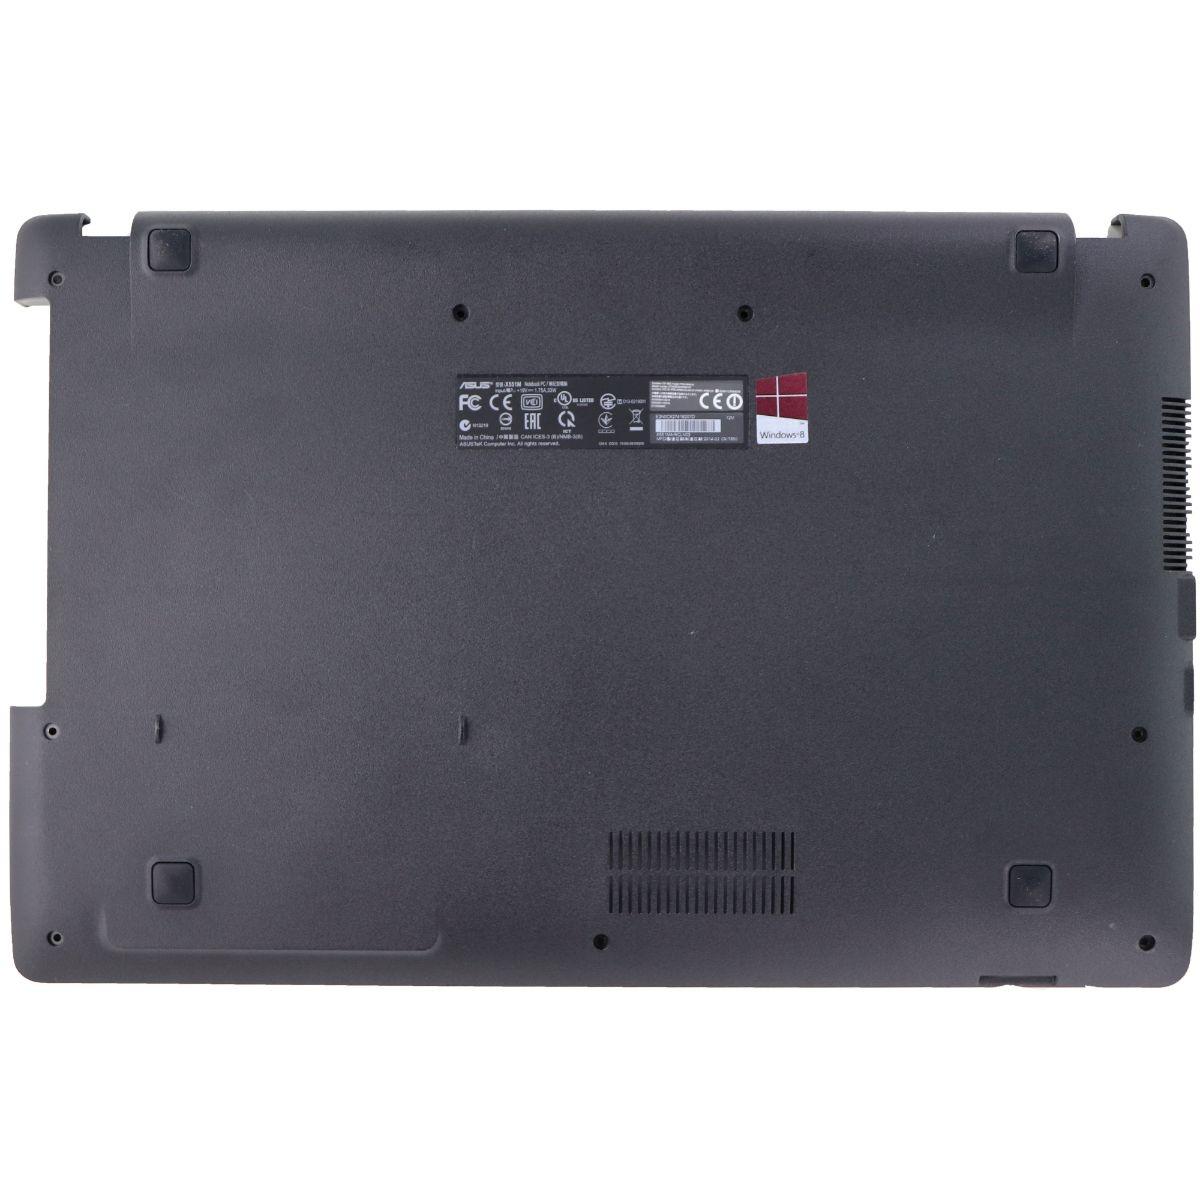 BOTTOM CASE COVER Asus X551M-RCLN03 Laptop - Black